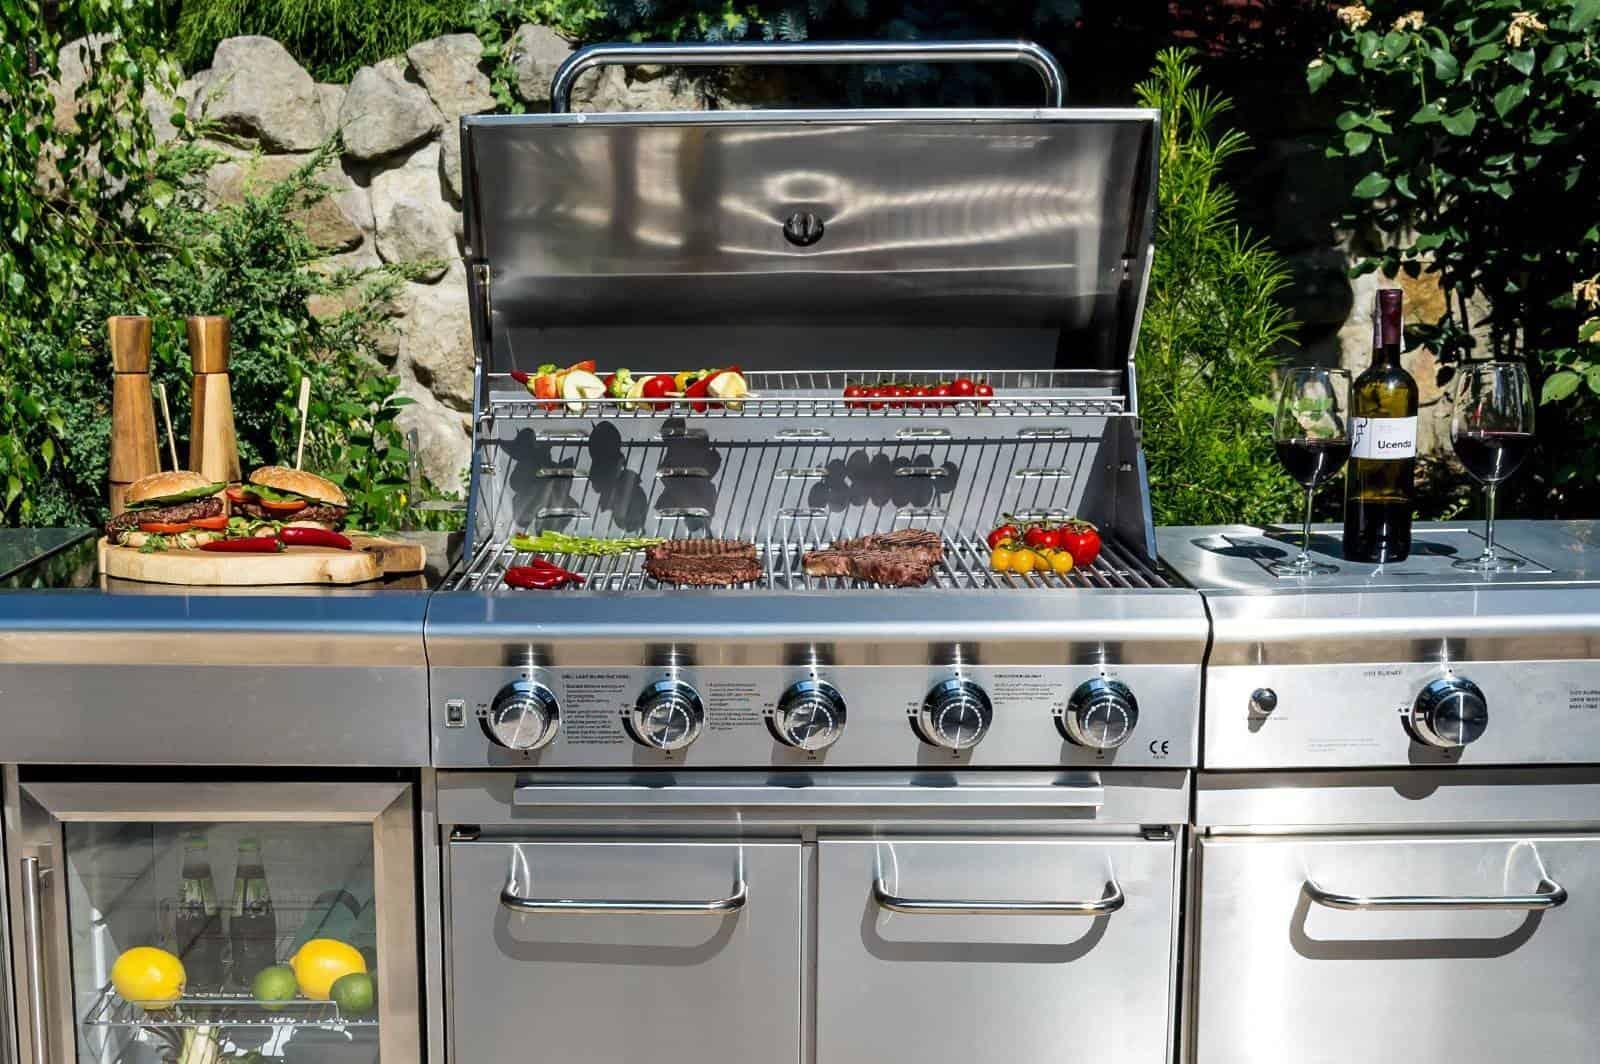 gazowa kuchnia ogrodowa SICILIA